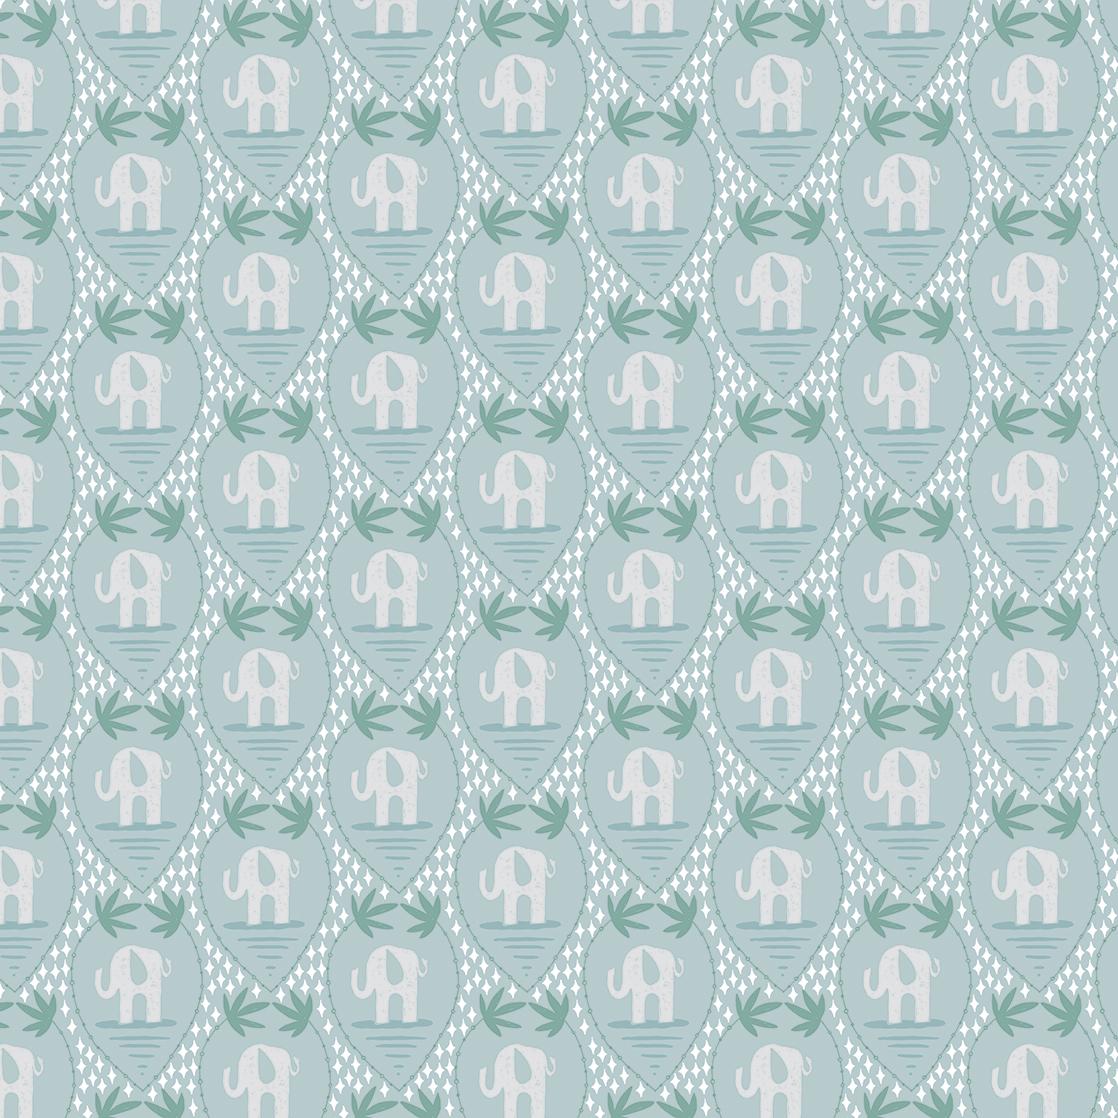 Elephant Stories – Pattern 2